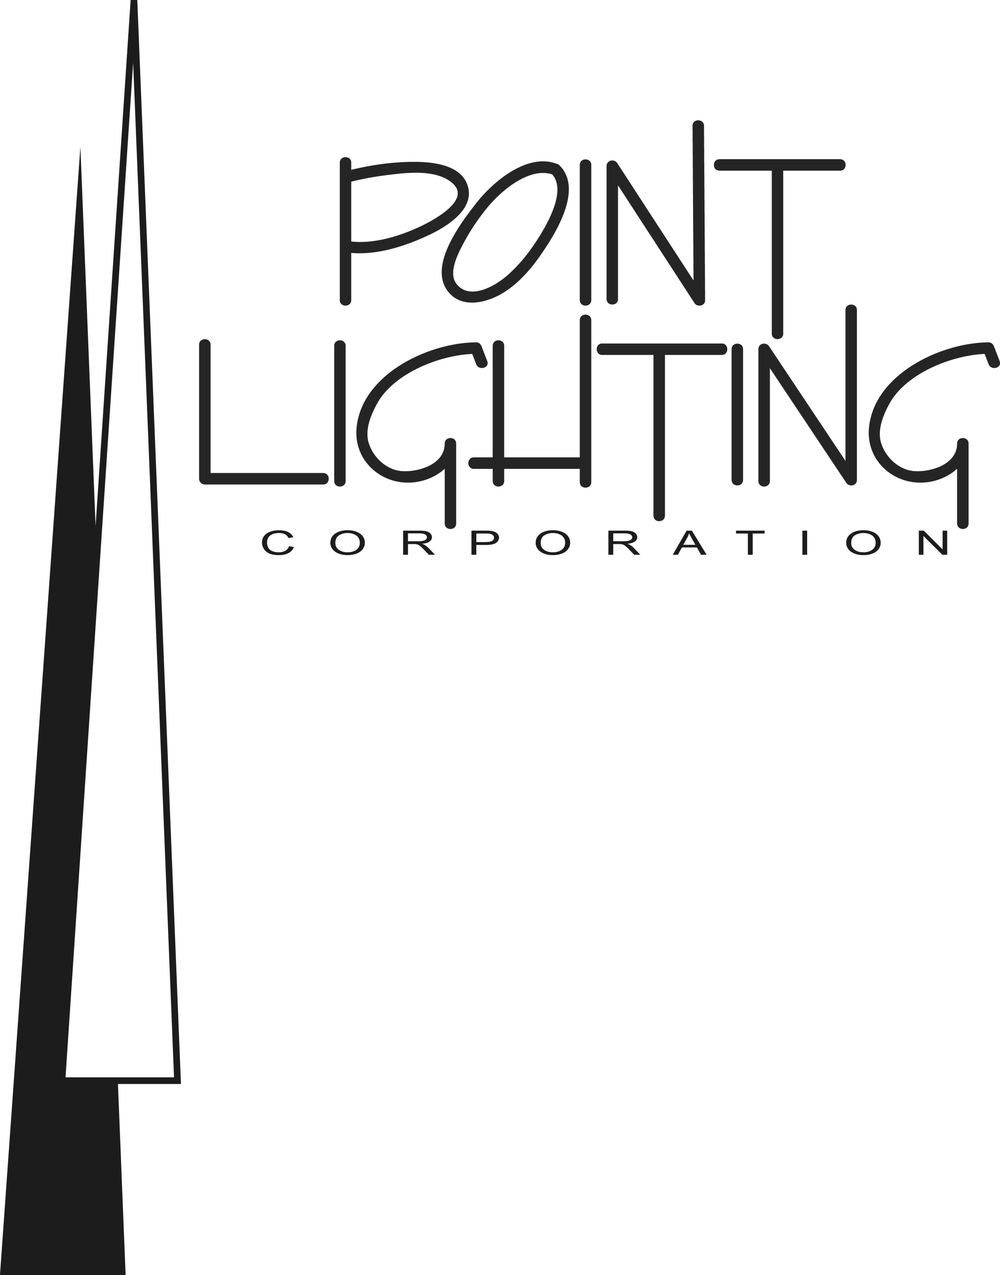 Point Lighting Corporation  sc 1 st  Domestic \u2014 Point Lighting Corporation & Domestic \u2014 Point Lighting Corporation